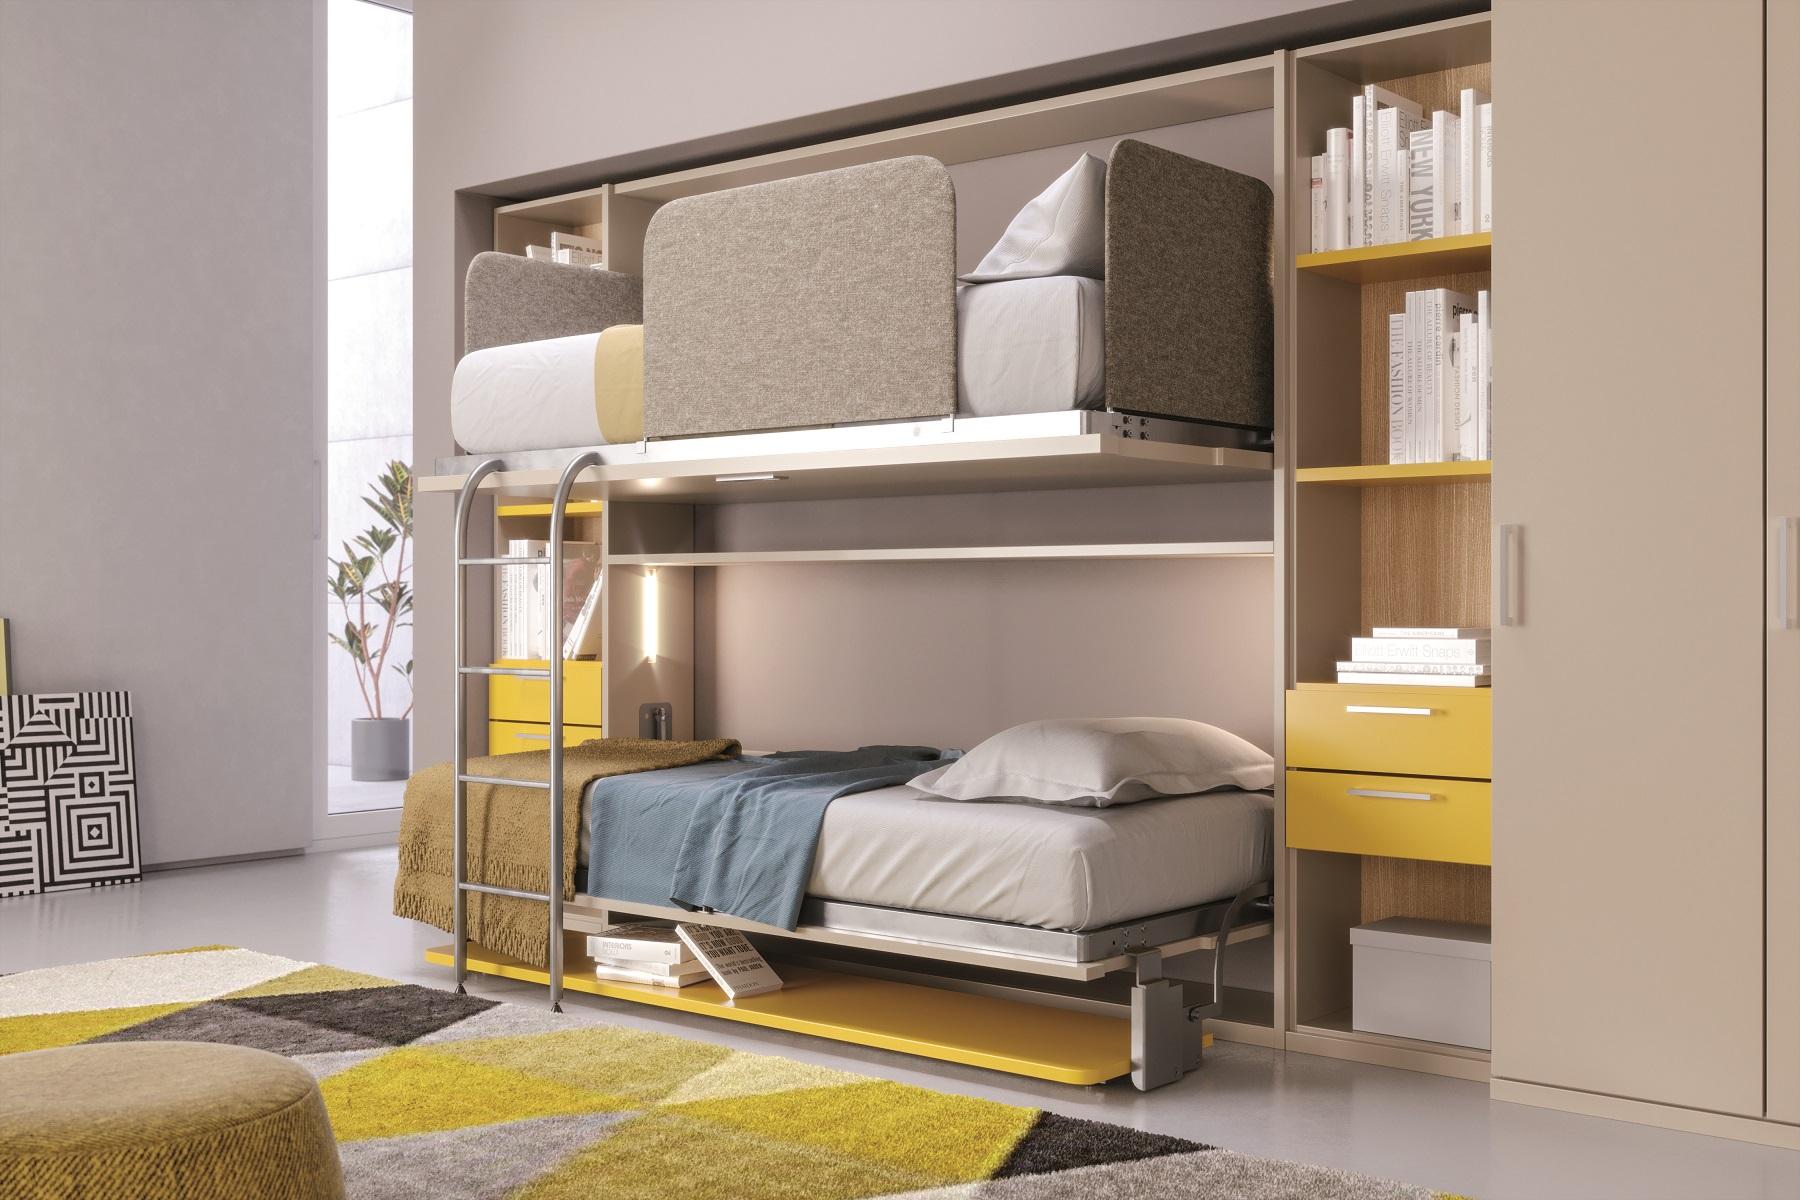 Double esspreso מיטות קיר נפתחות